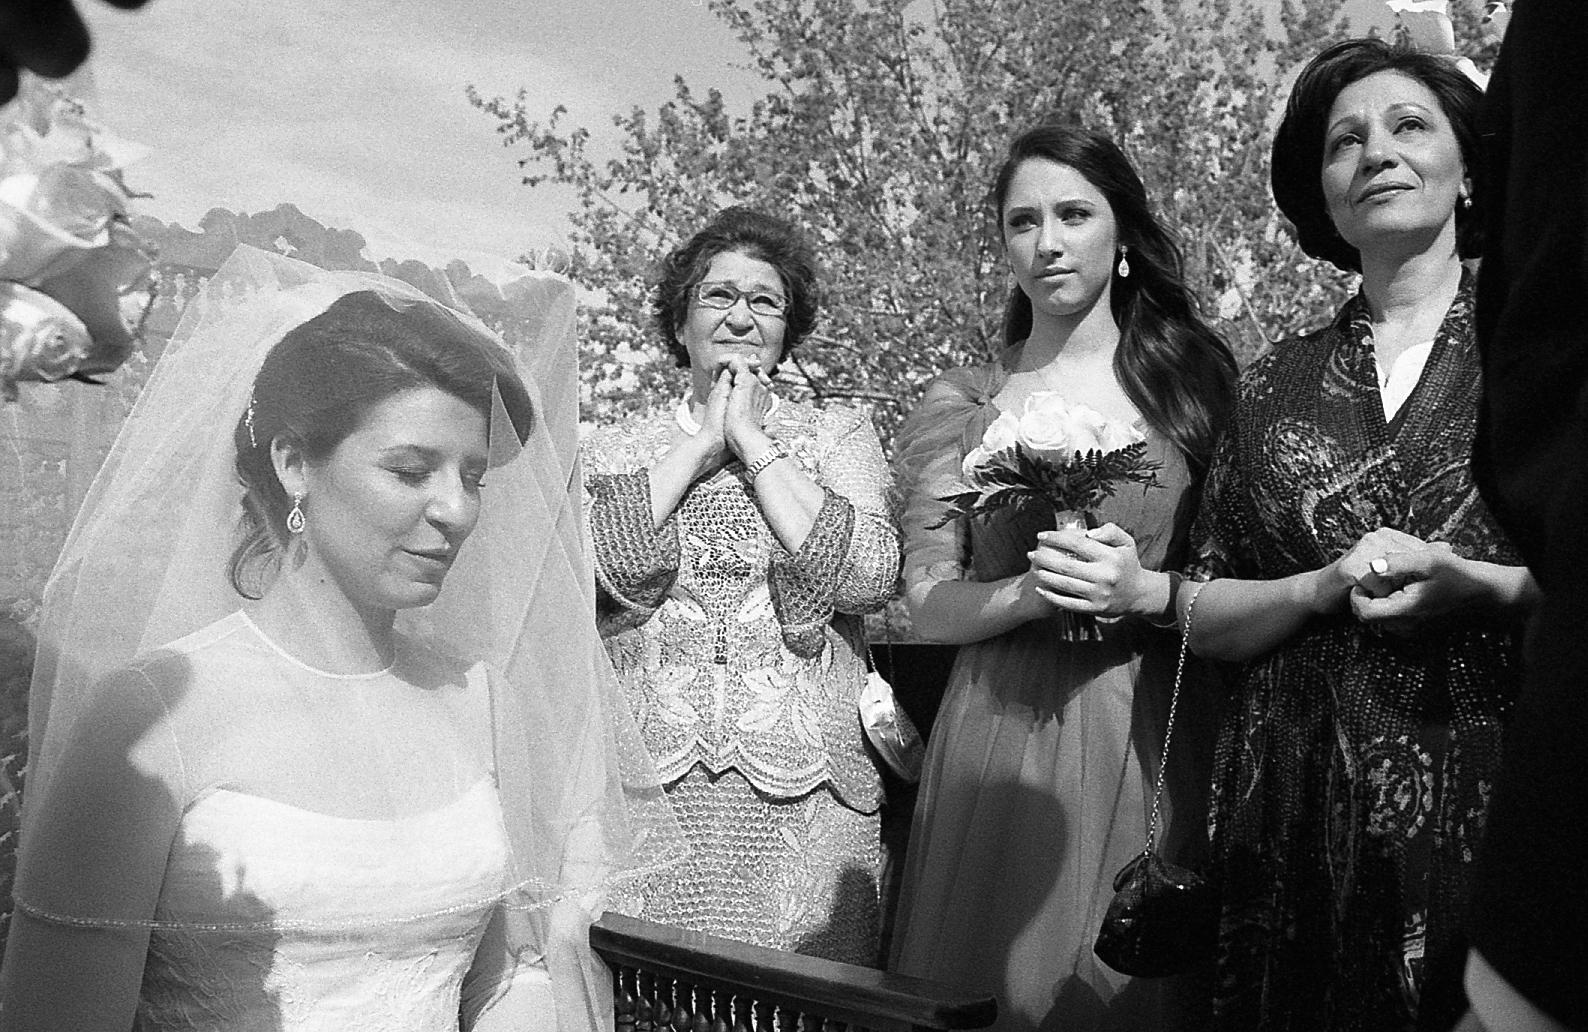 jewish wedding.jpeg